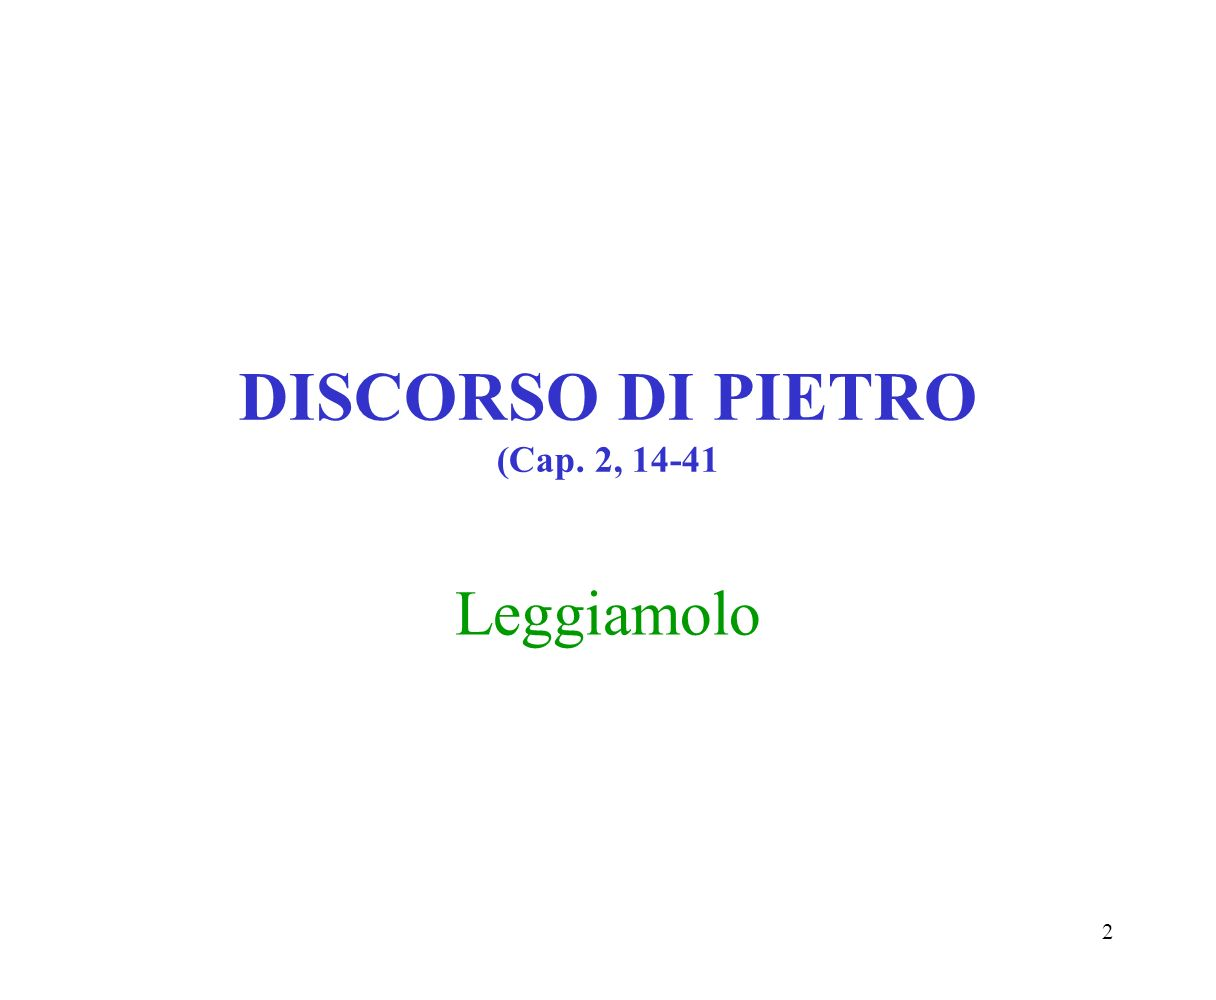 DISCORSO DI PIETRO (Cap. 2, 14-41